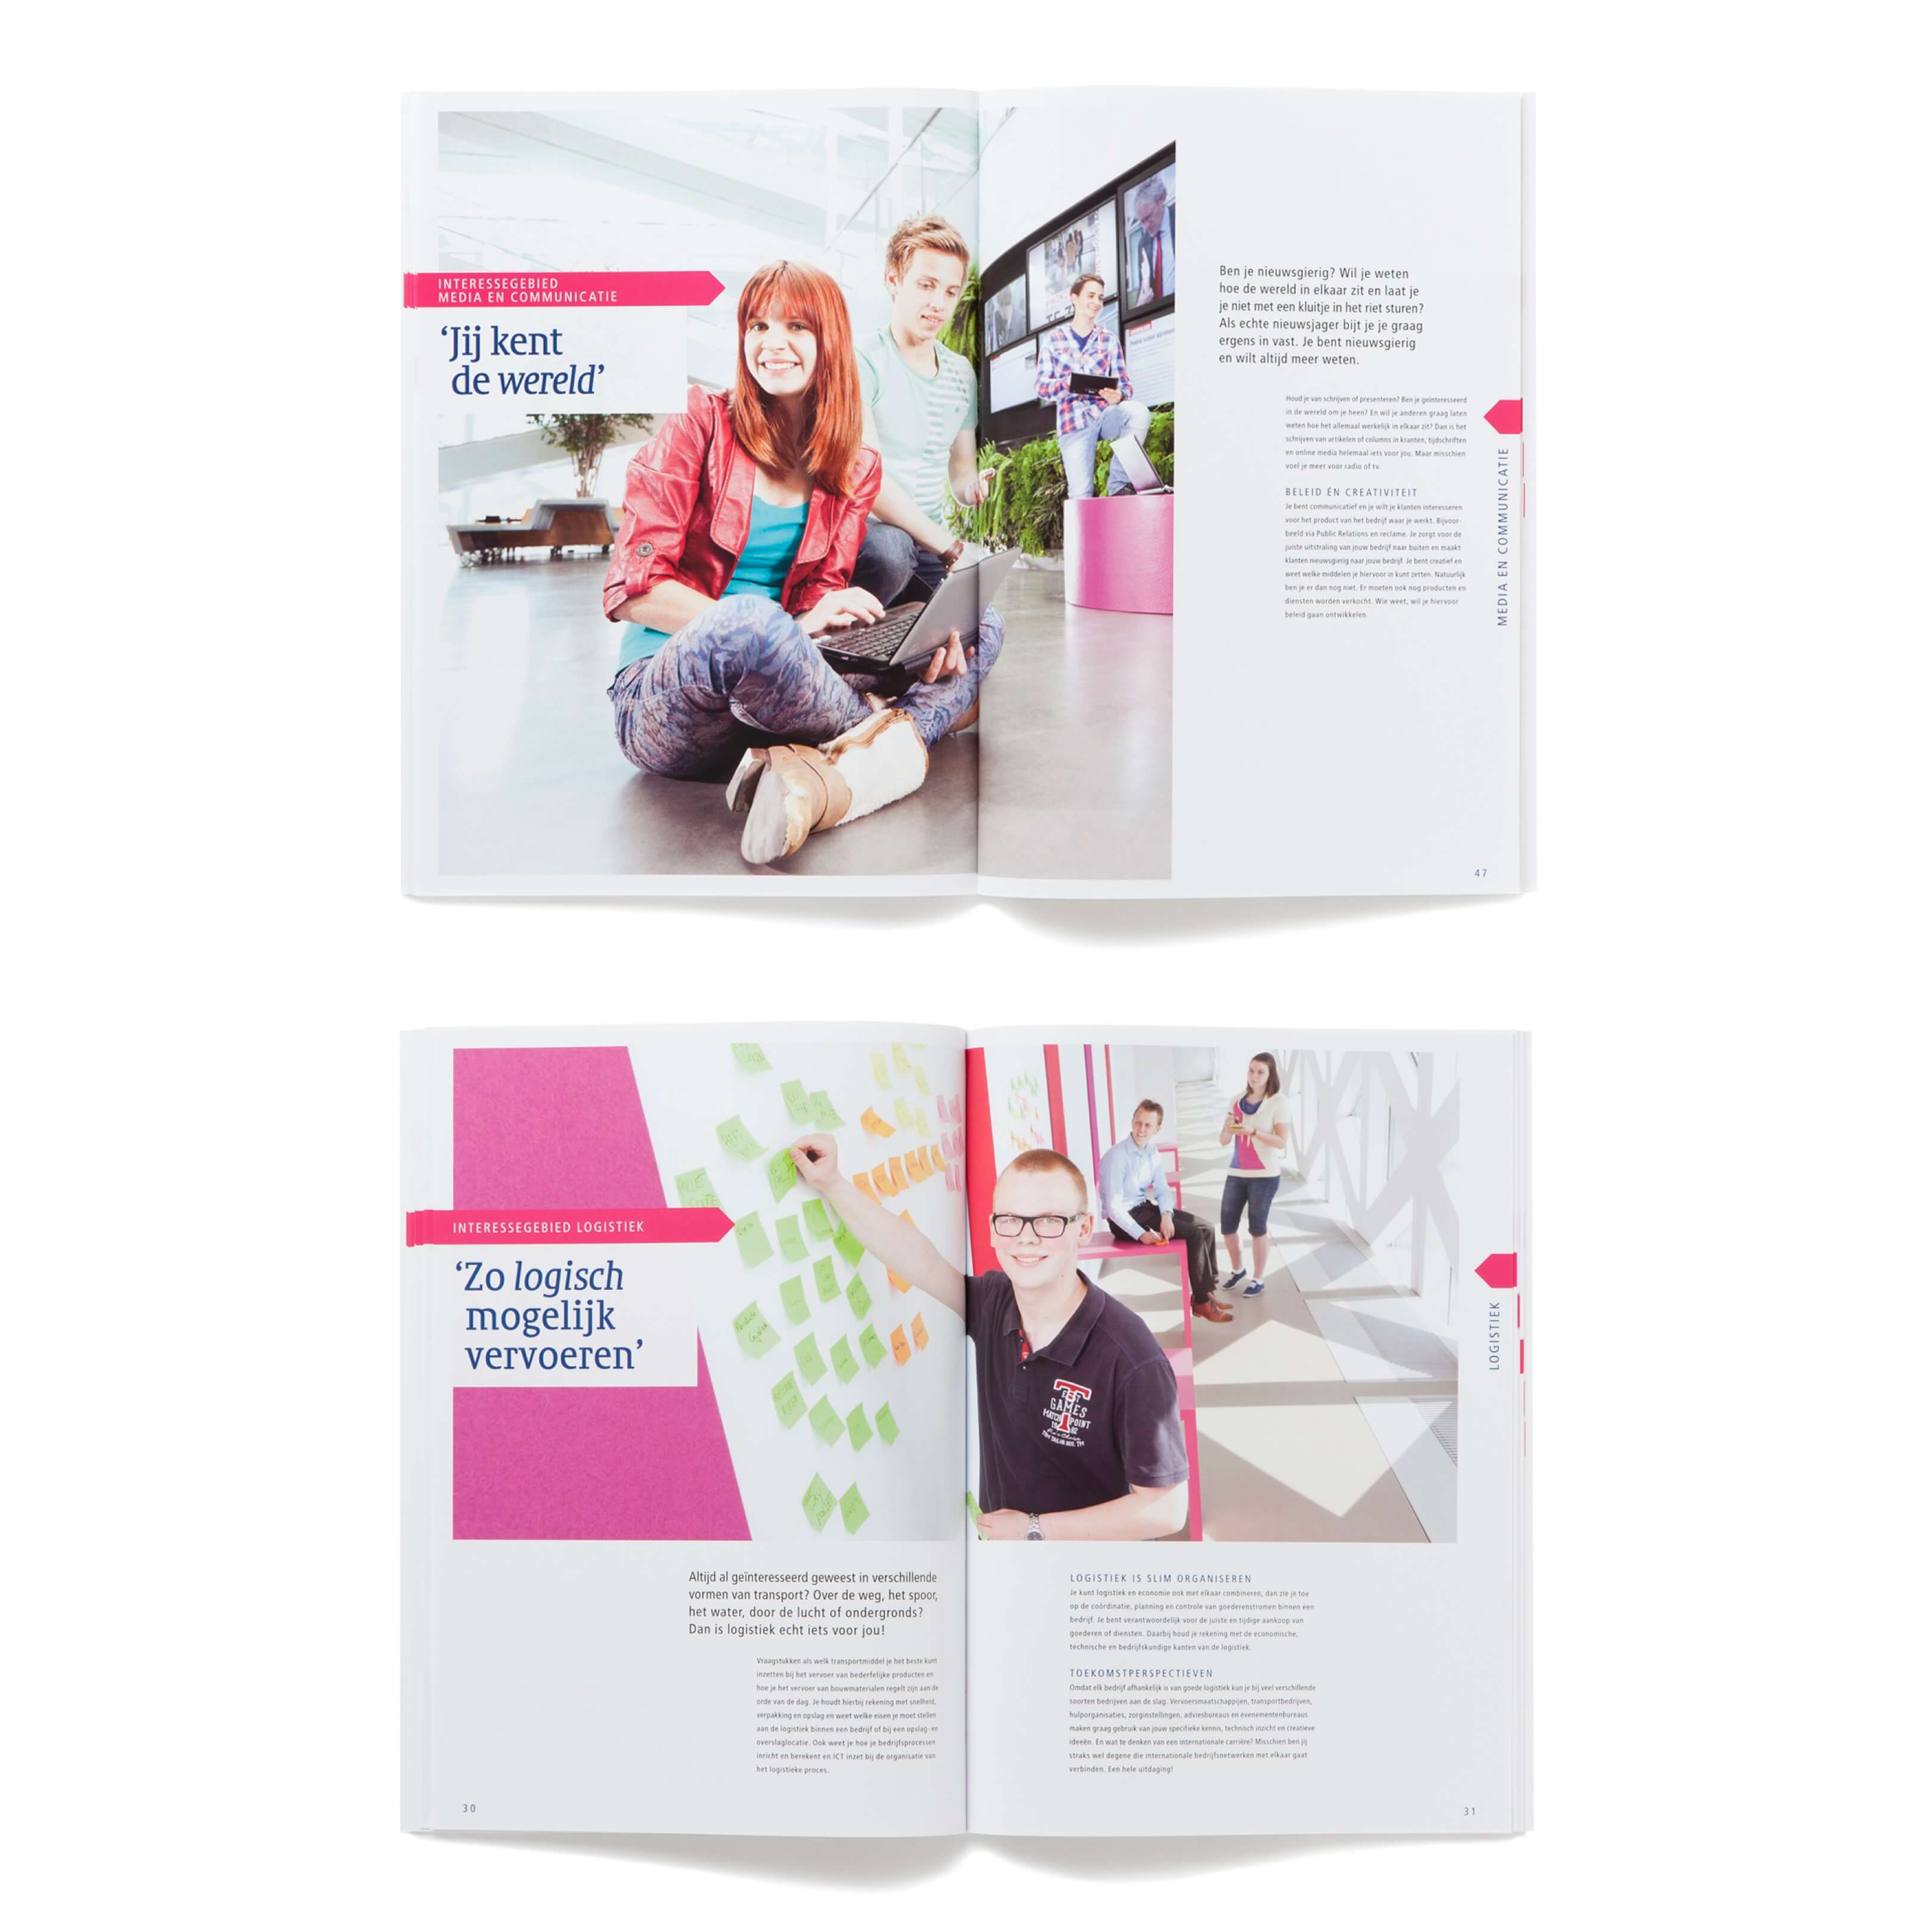 Jurjen Poeles Fotografie opleidingsbrochures opleiding brochure Hogeschool Windesheim Zwolle student leerling studie sport school educatie